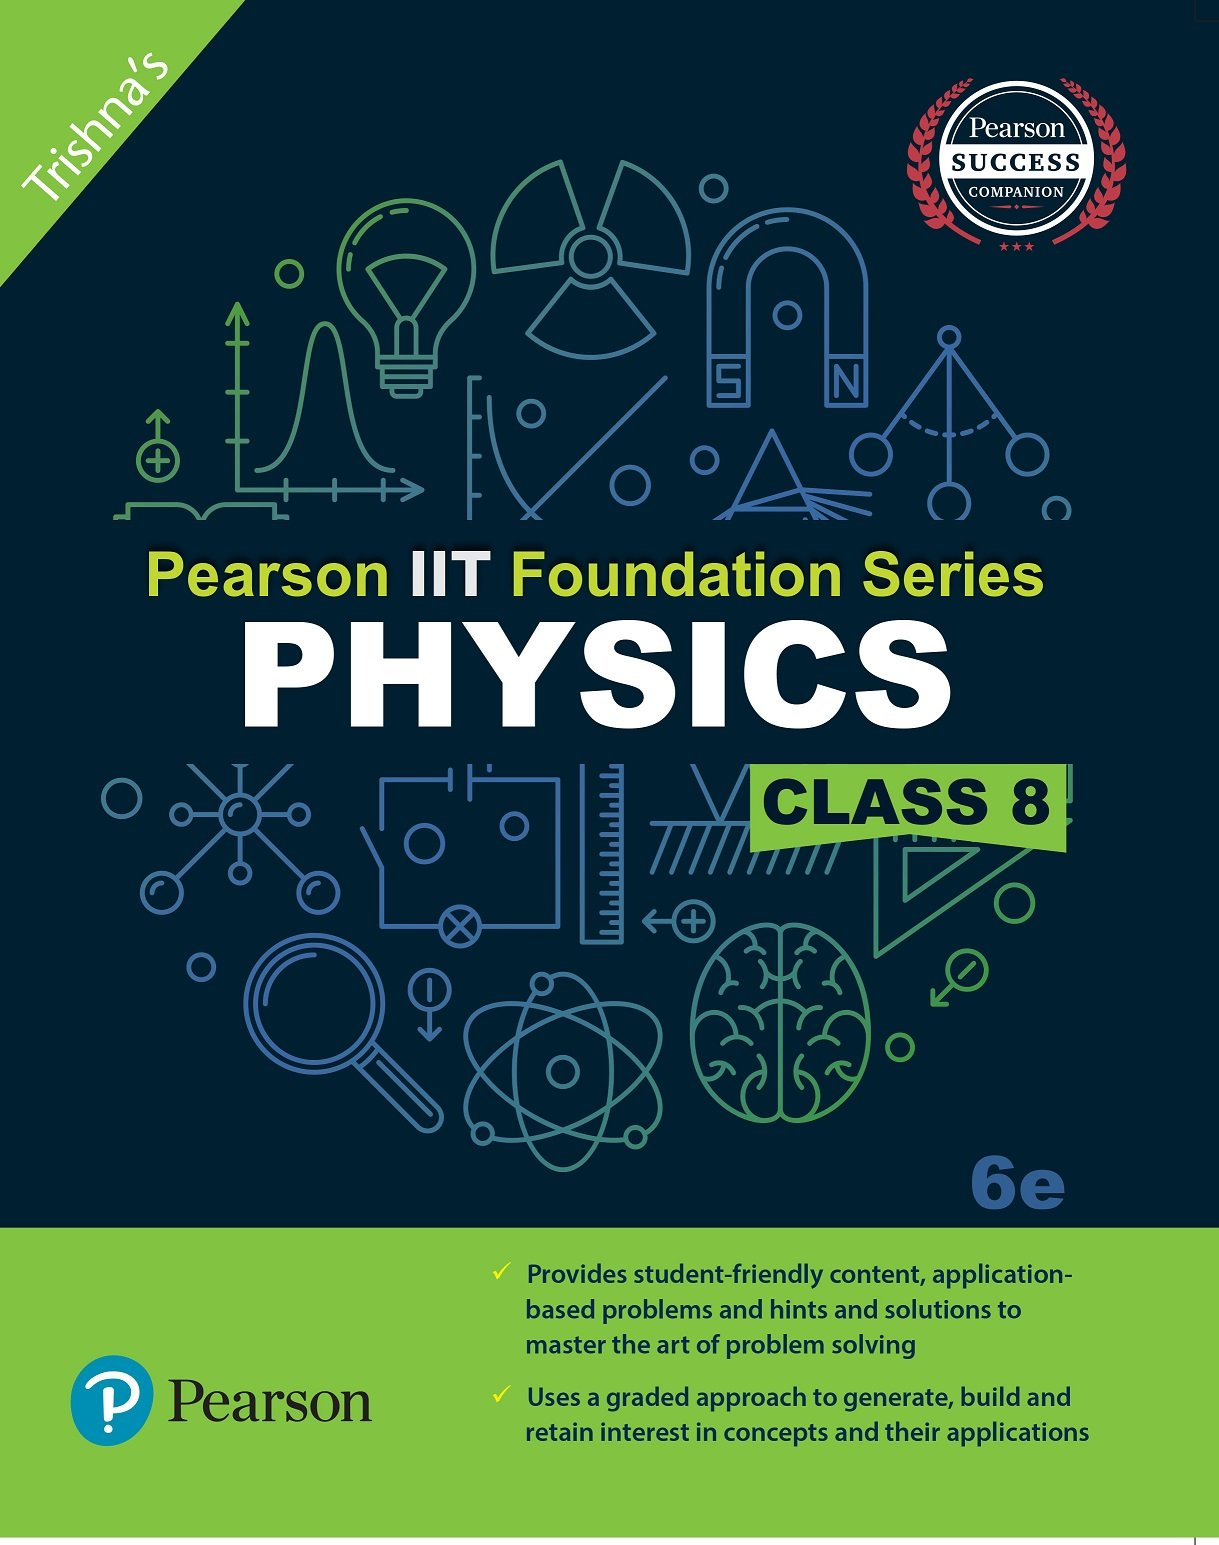 Pearson IIT Foundation Physics Class 8 Old Edition Amazon